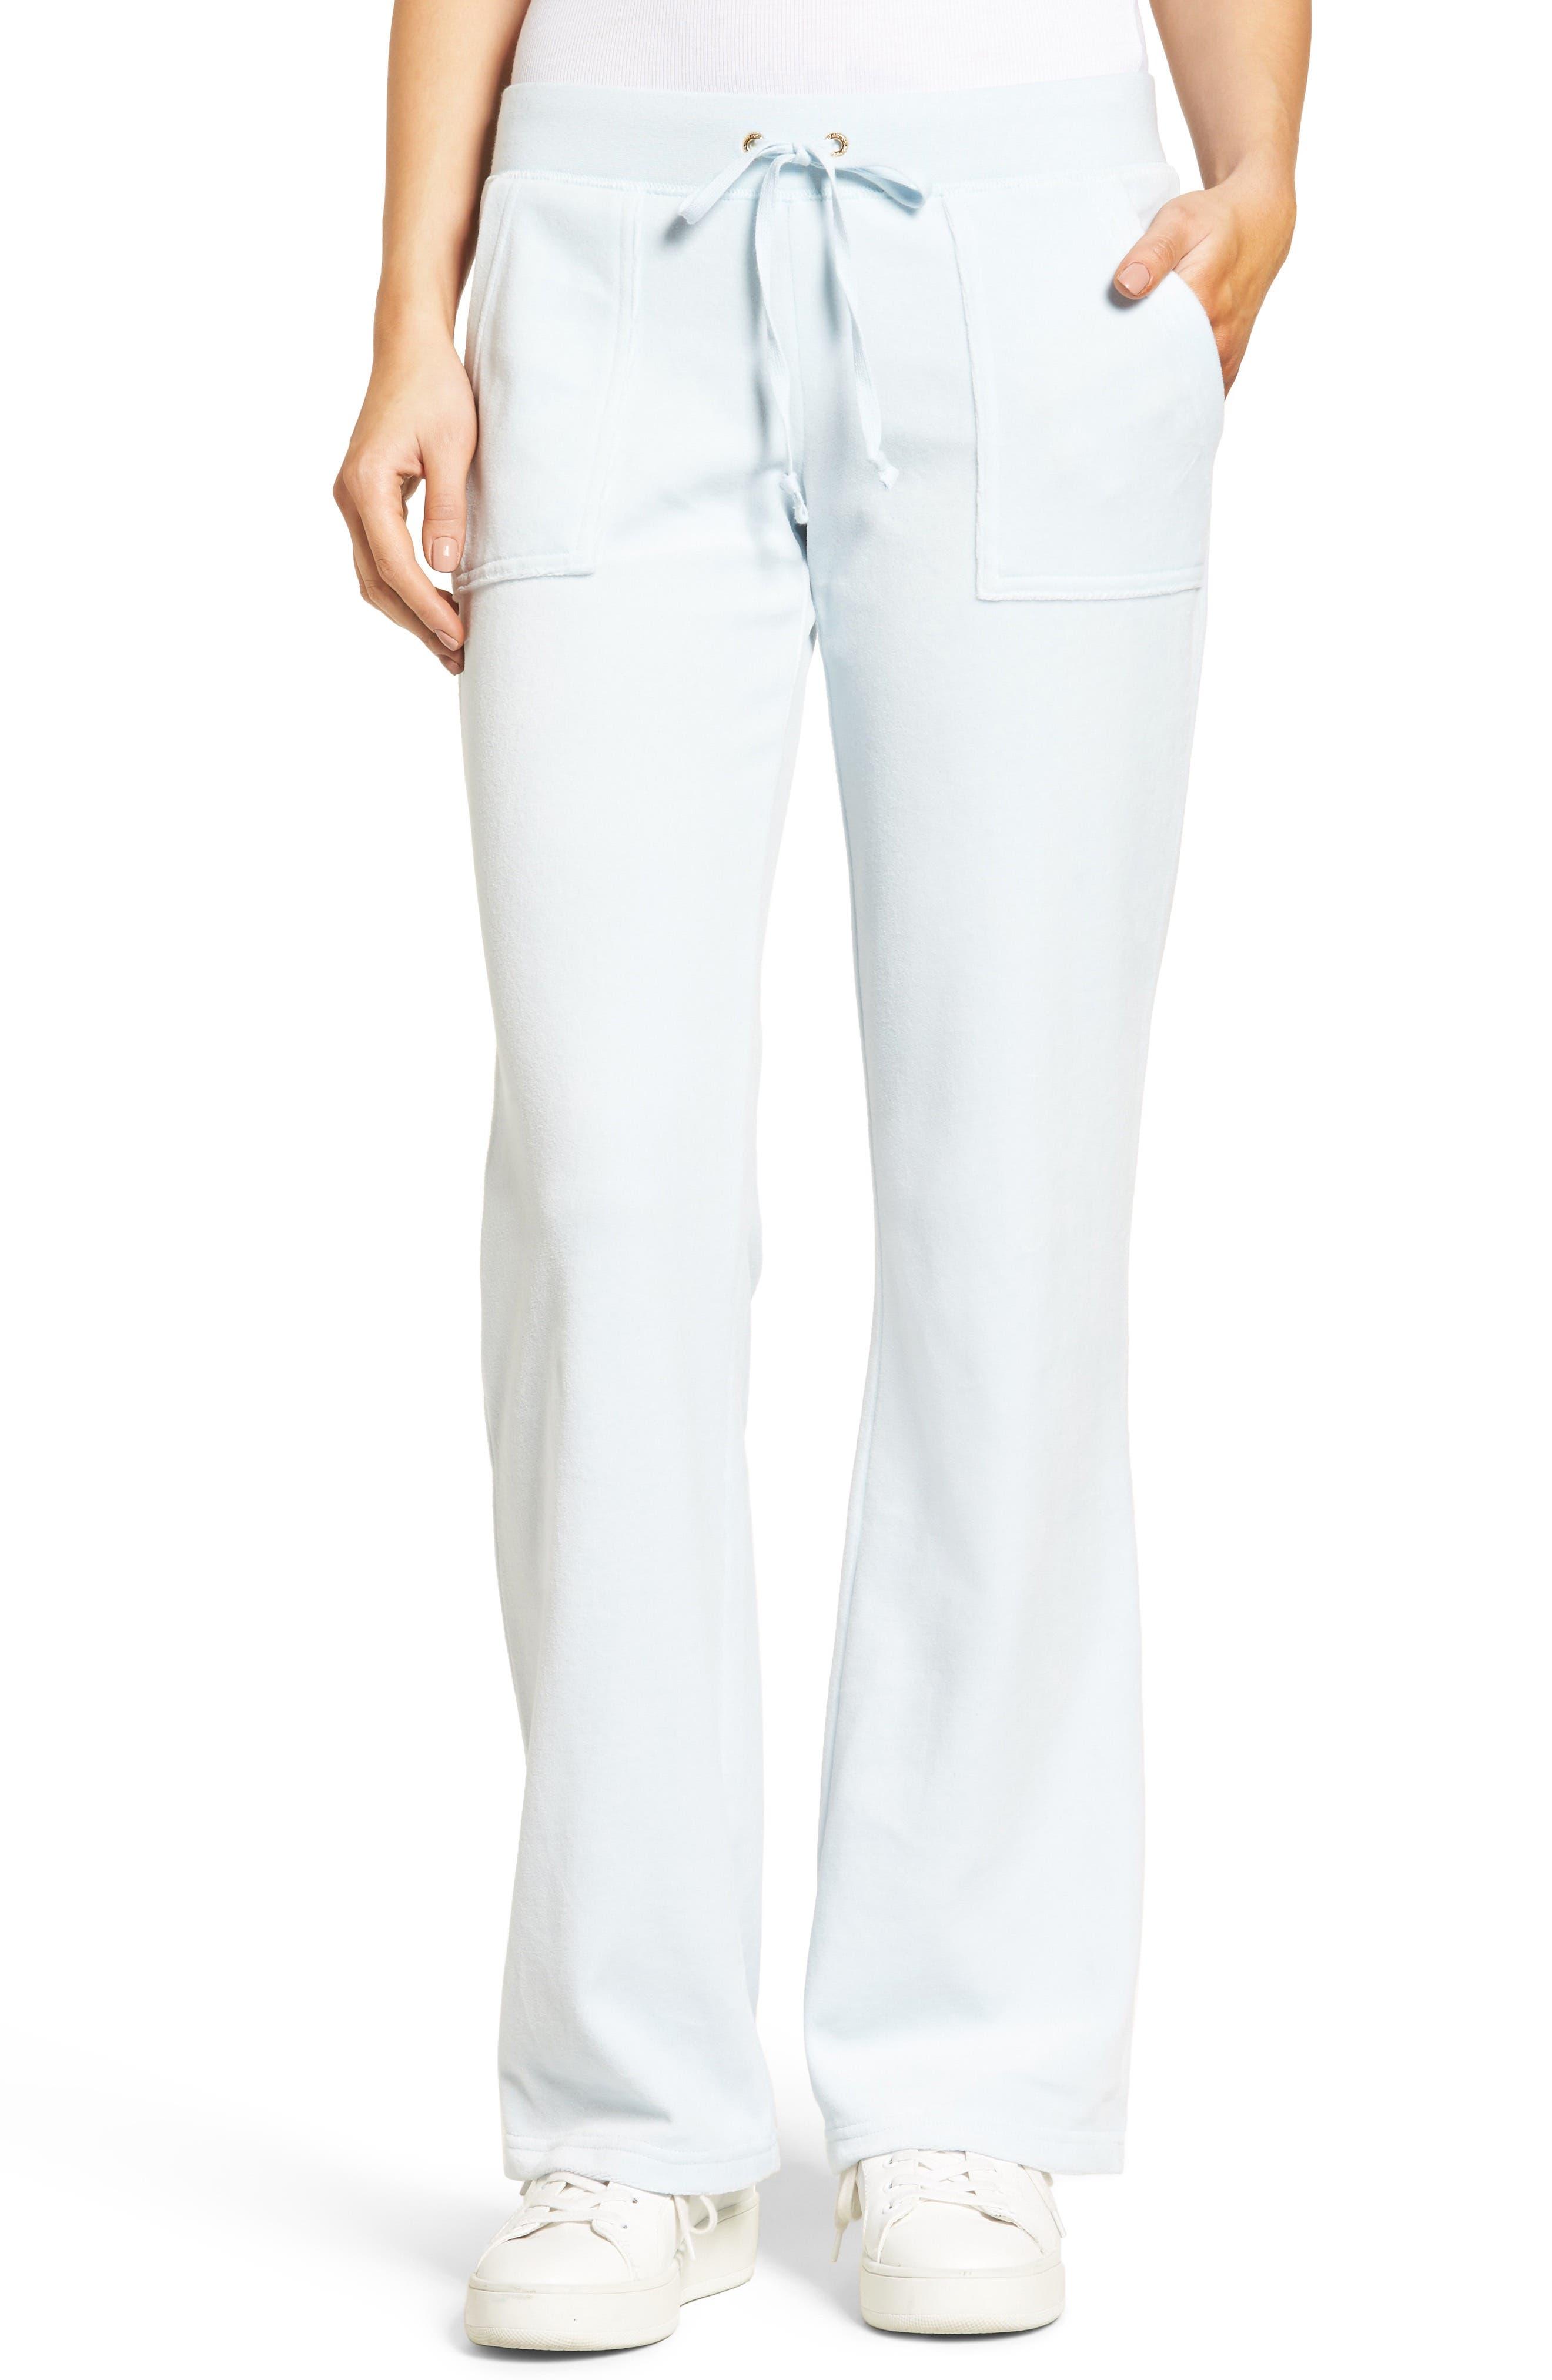 Juicy Couture Del Rey Velour Track Pants